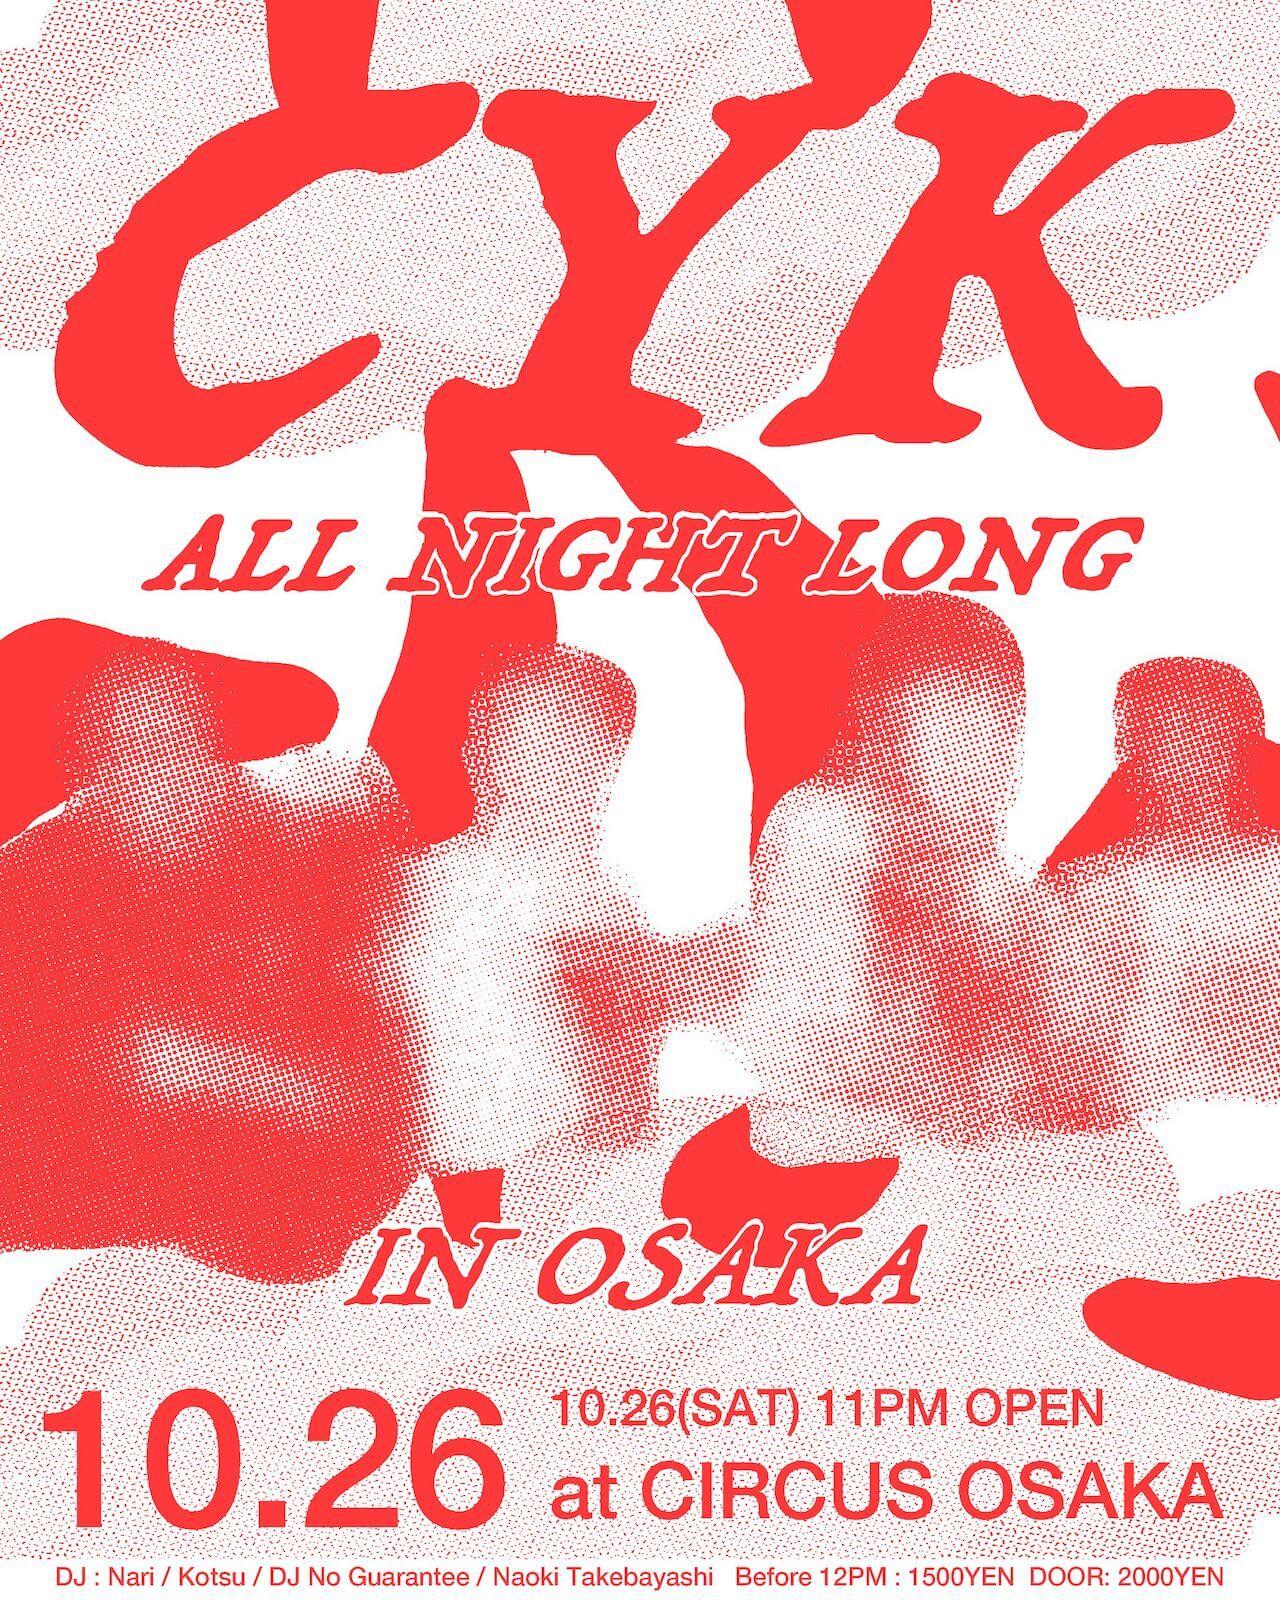 CYKが大阪でオールナイトロングセットを披露 明日、Circus OSAKAにて開催 music191025-cykosaka